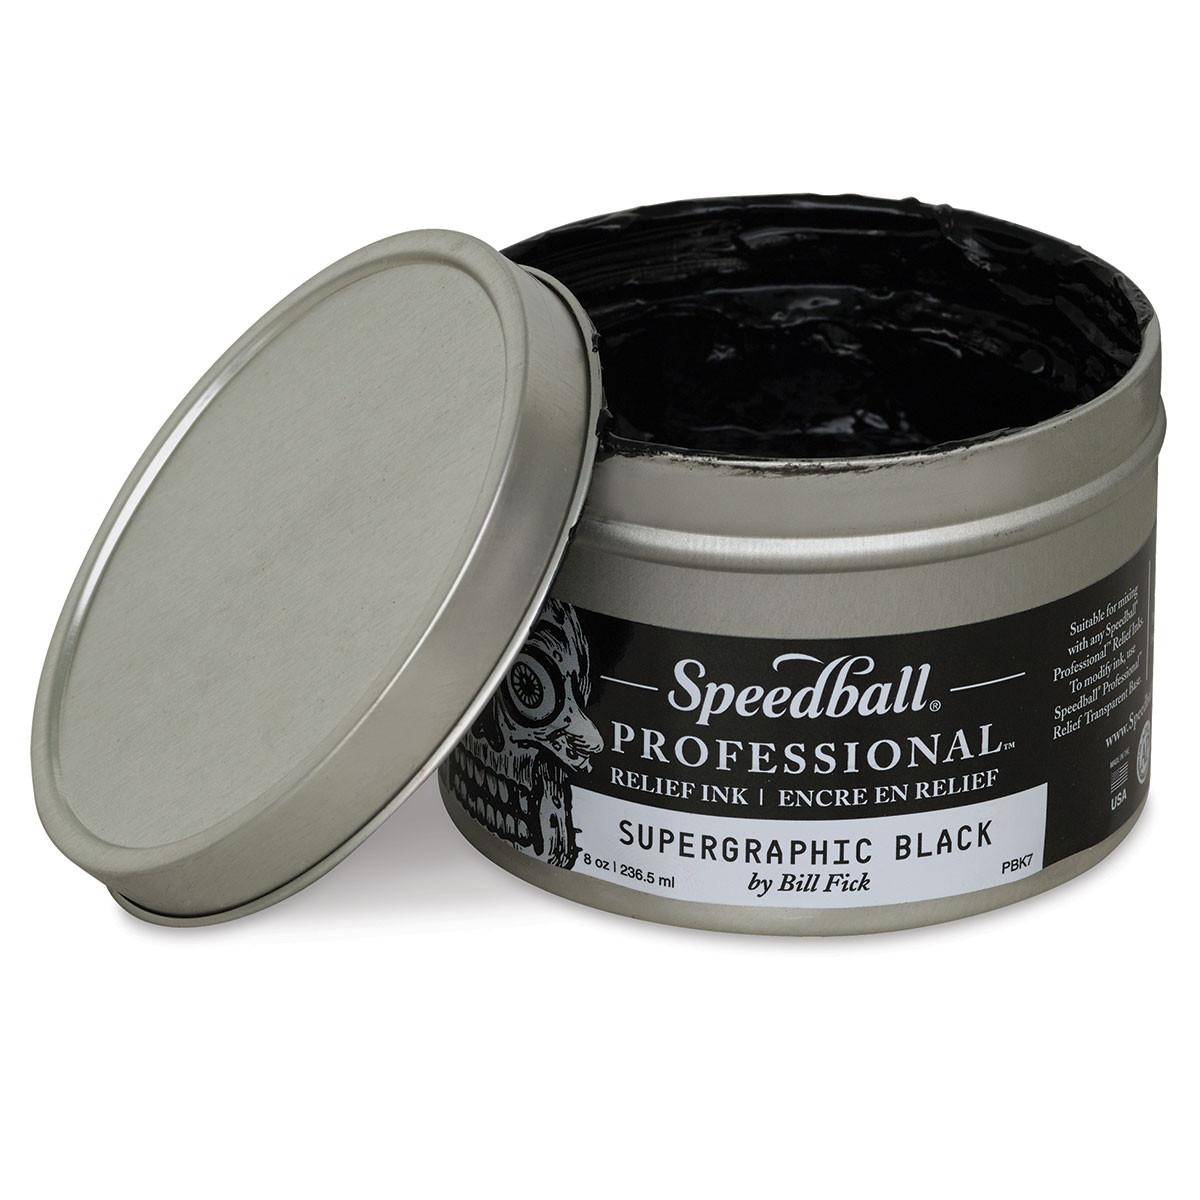 Speedball Professional Relief Ink - Supergraphic Black, 8 oz